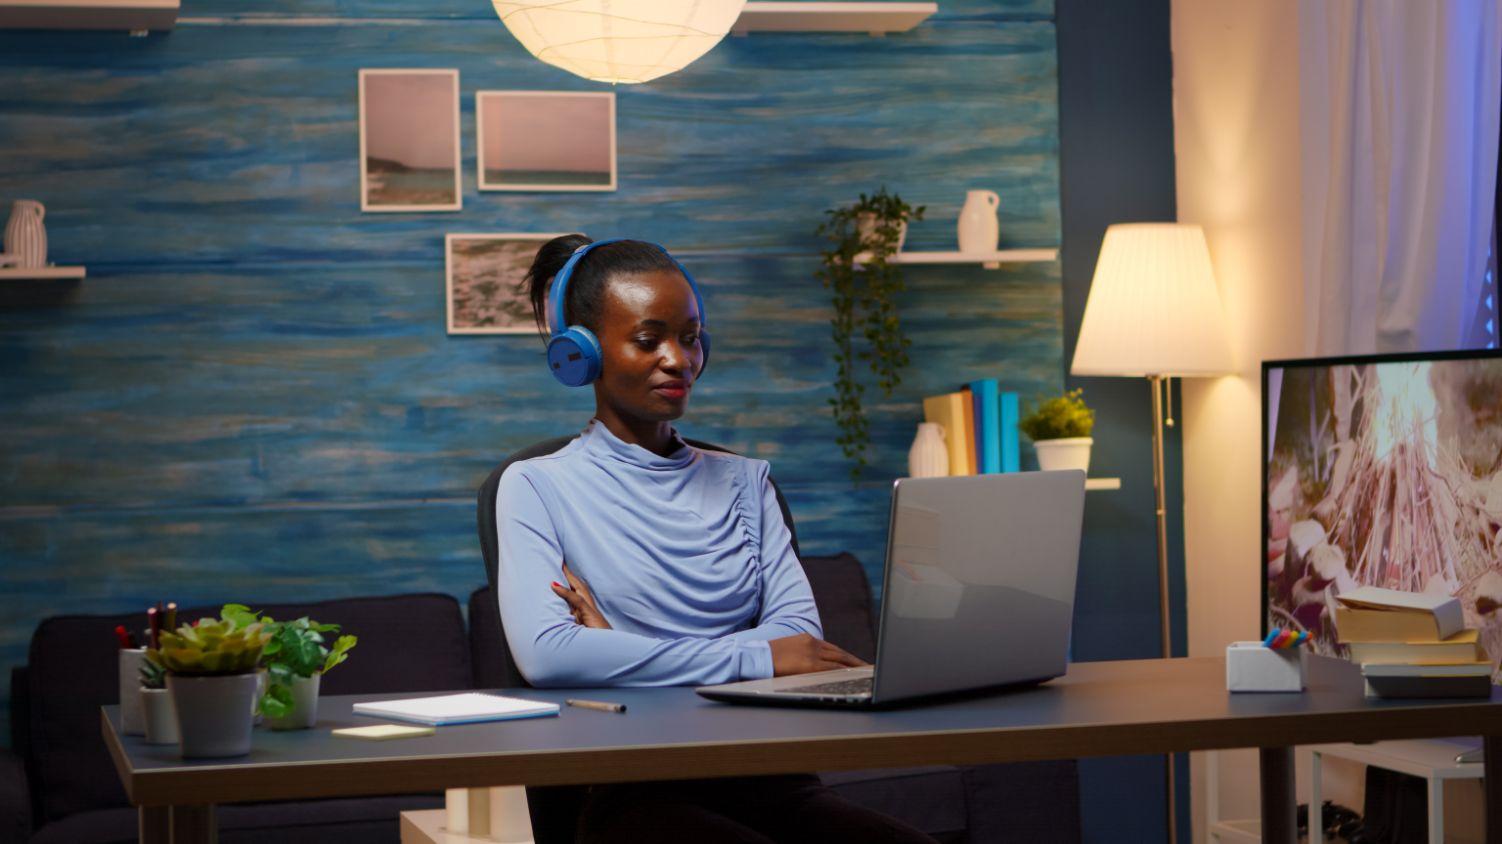 african american with wireless headphones listenin QKHFH